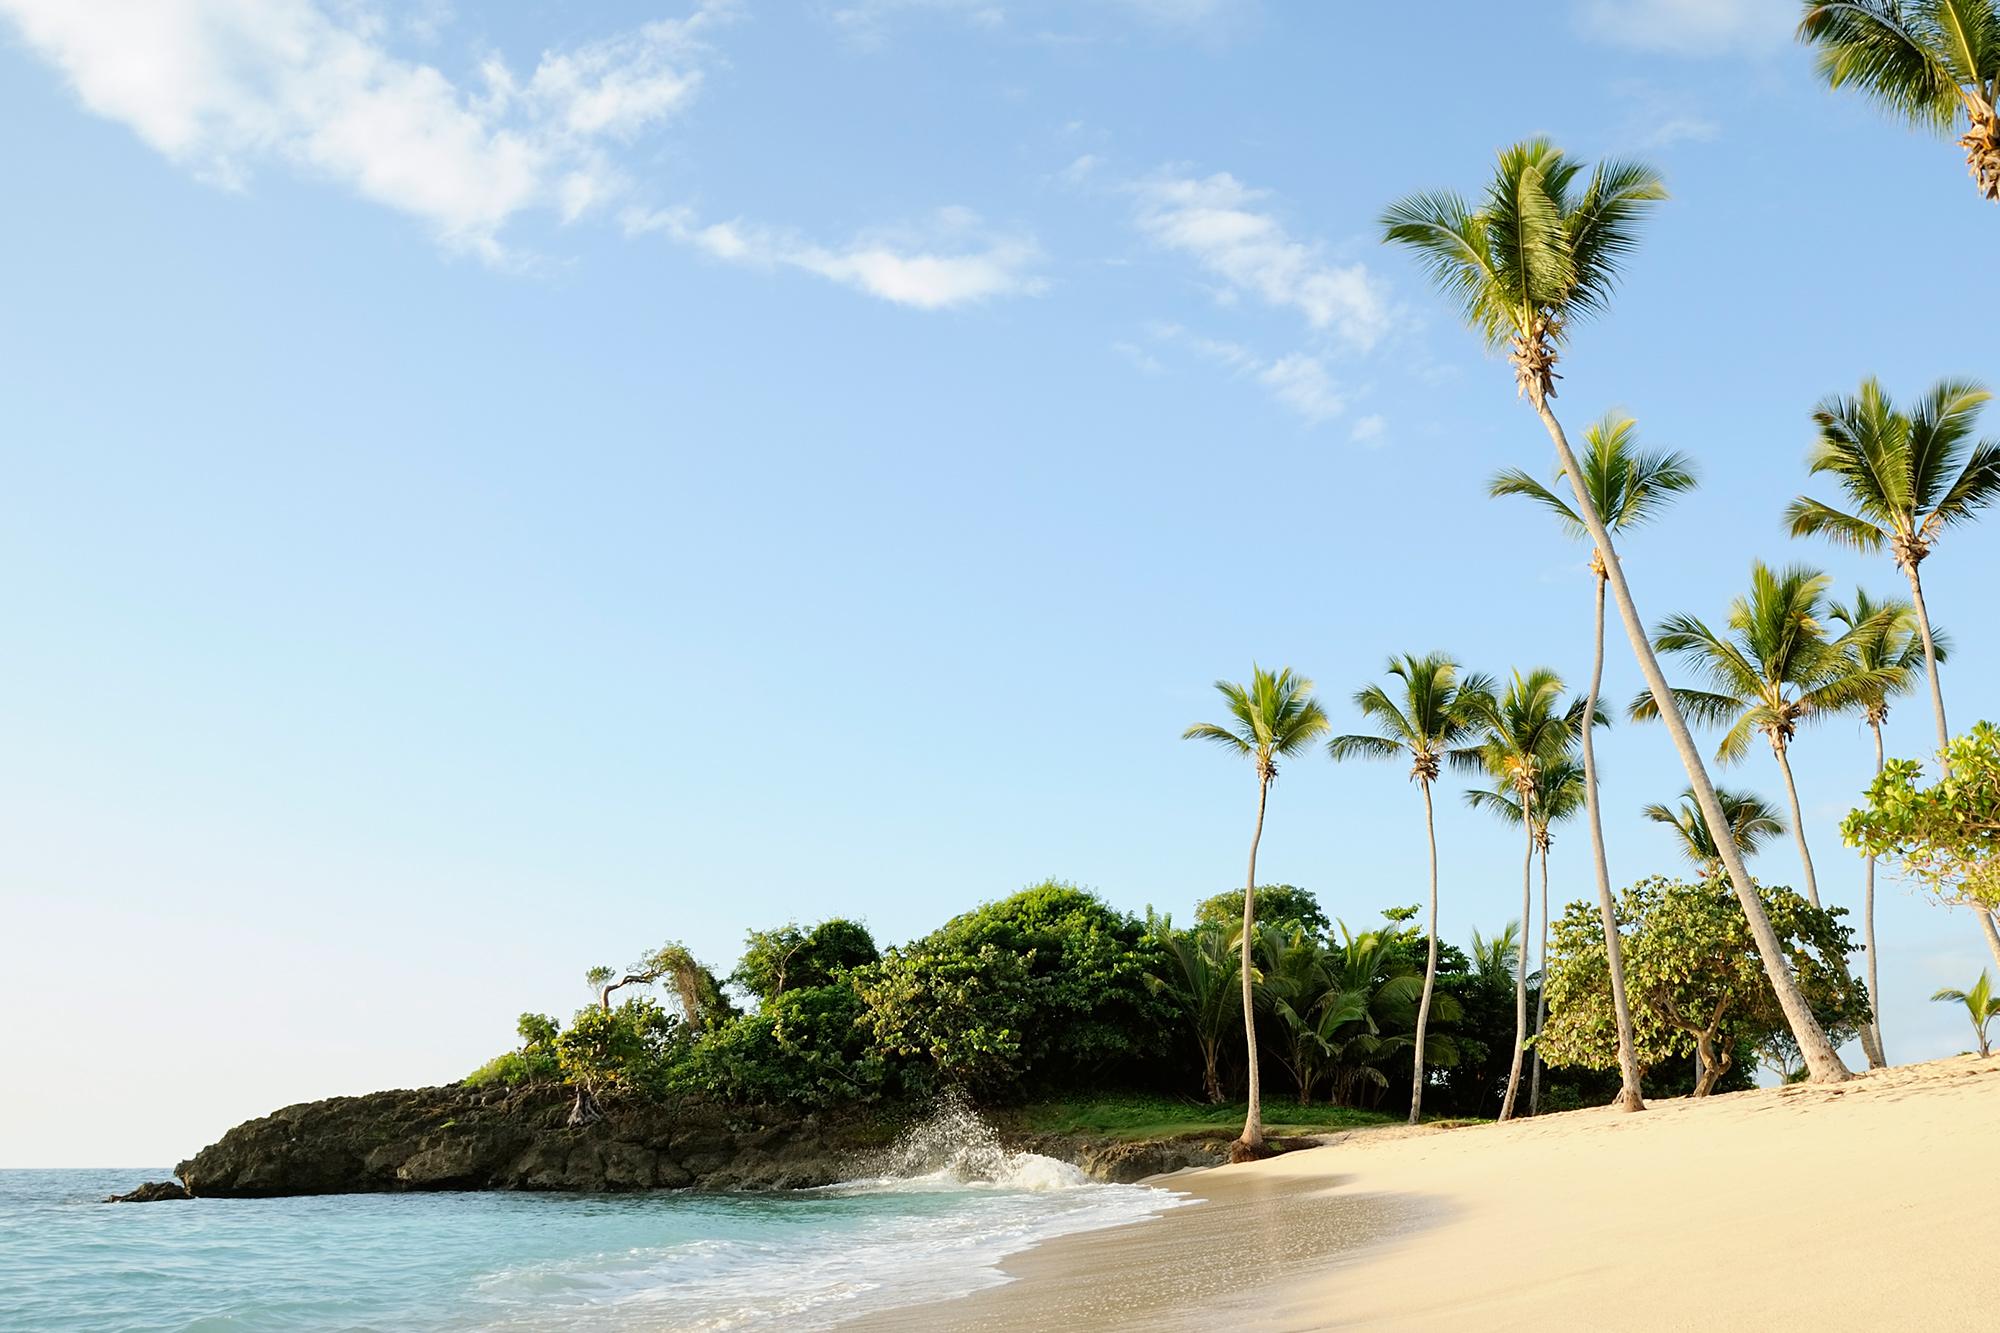 hawaii urlaub surfen strand inselhopping mit tui. Black Bedroom Furniture Sets. Home Design Ideas